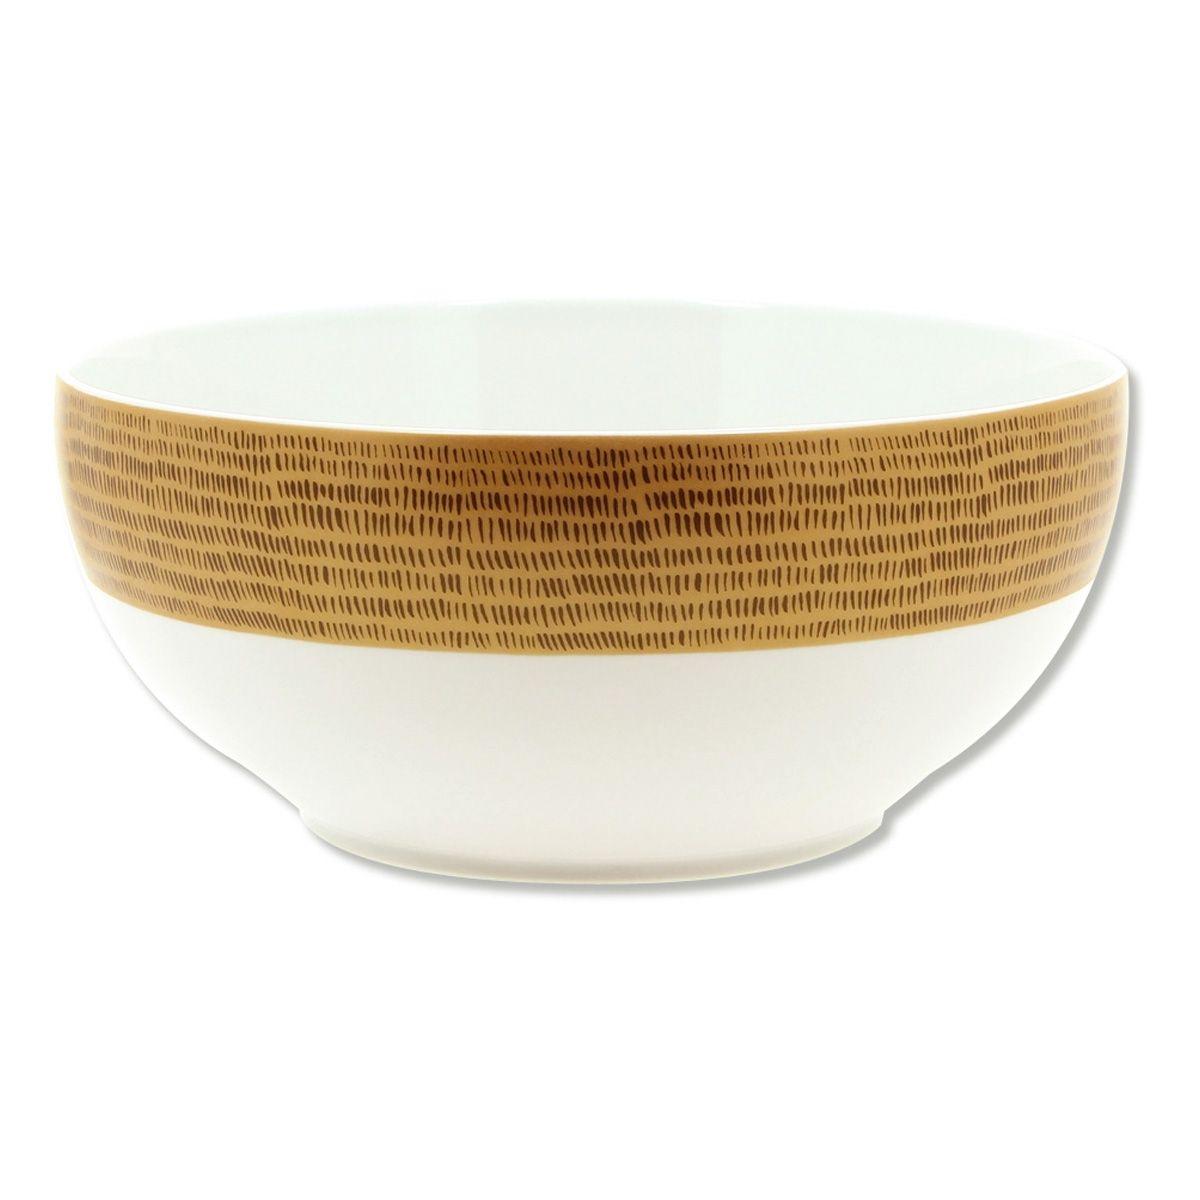 Saladier en porcelaine 25cm - DAYA DORE